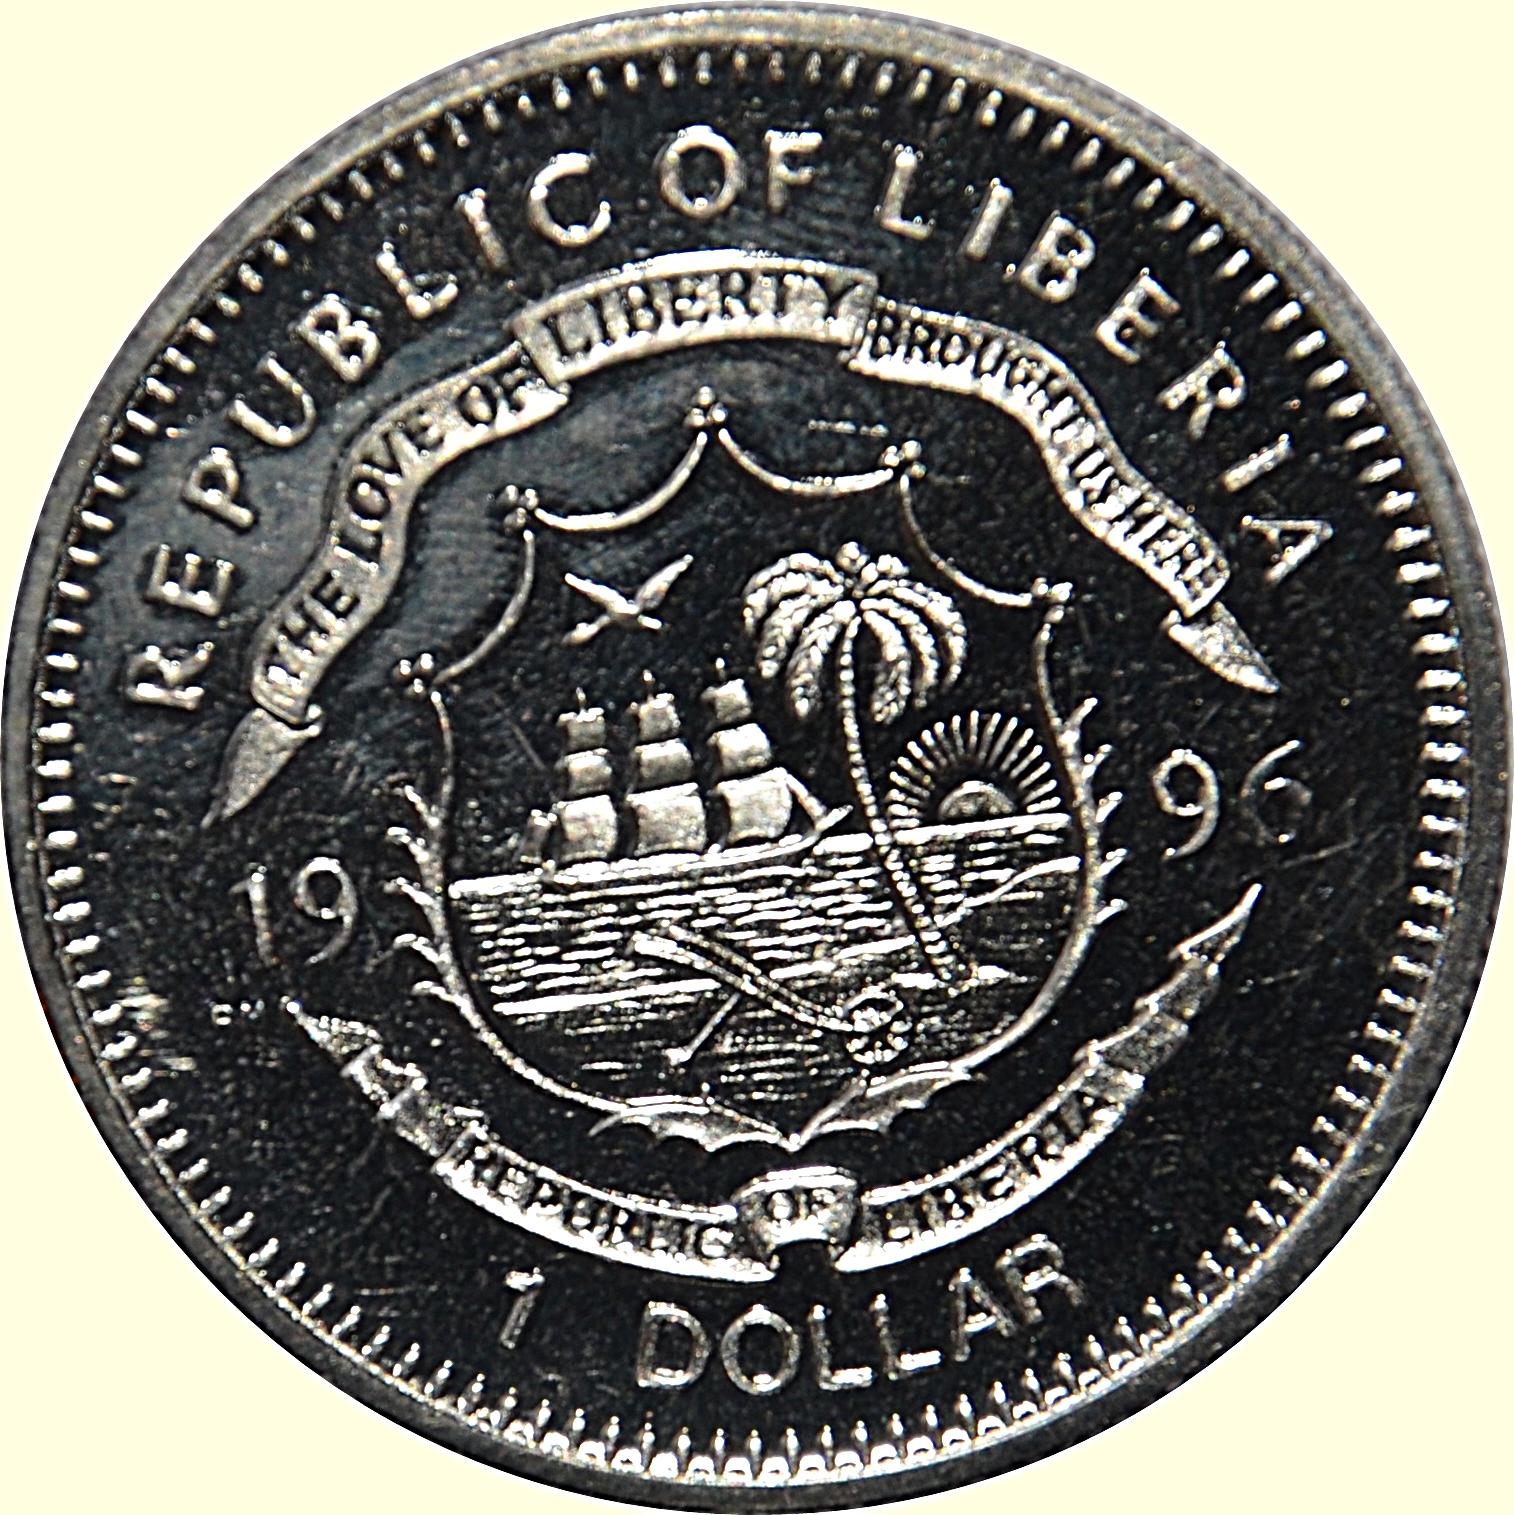 $1 Dollar CuNi Coin 1996 LIBERIA AFRICA Preserve Planet Earth BIRDS LOVEBIRDS